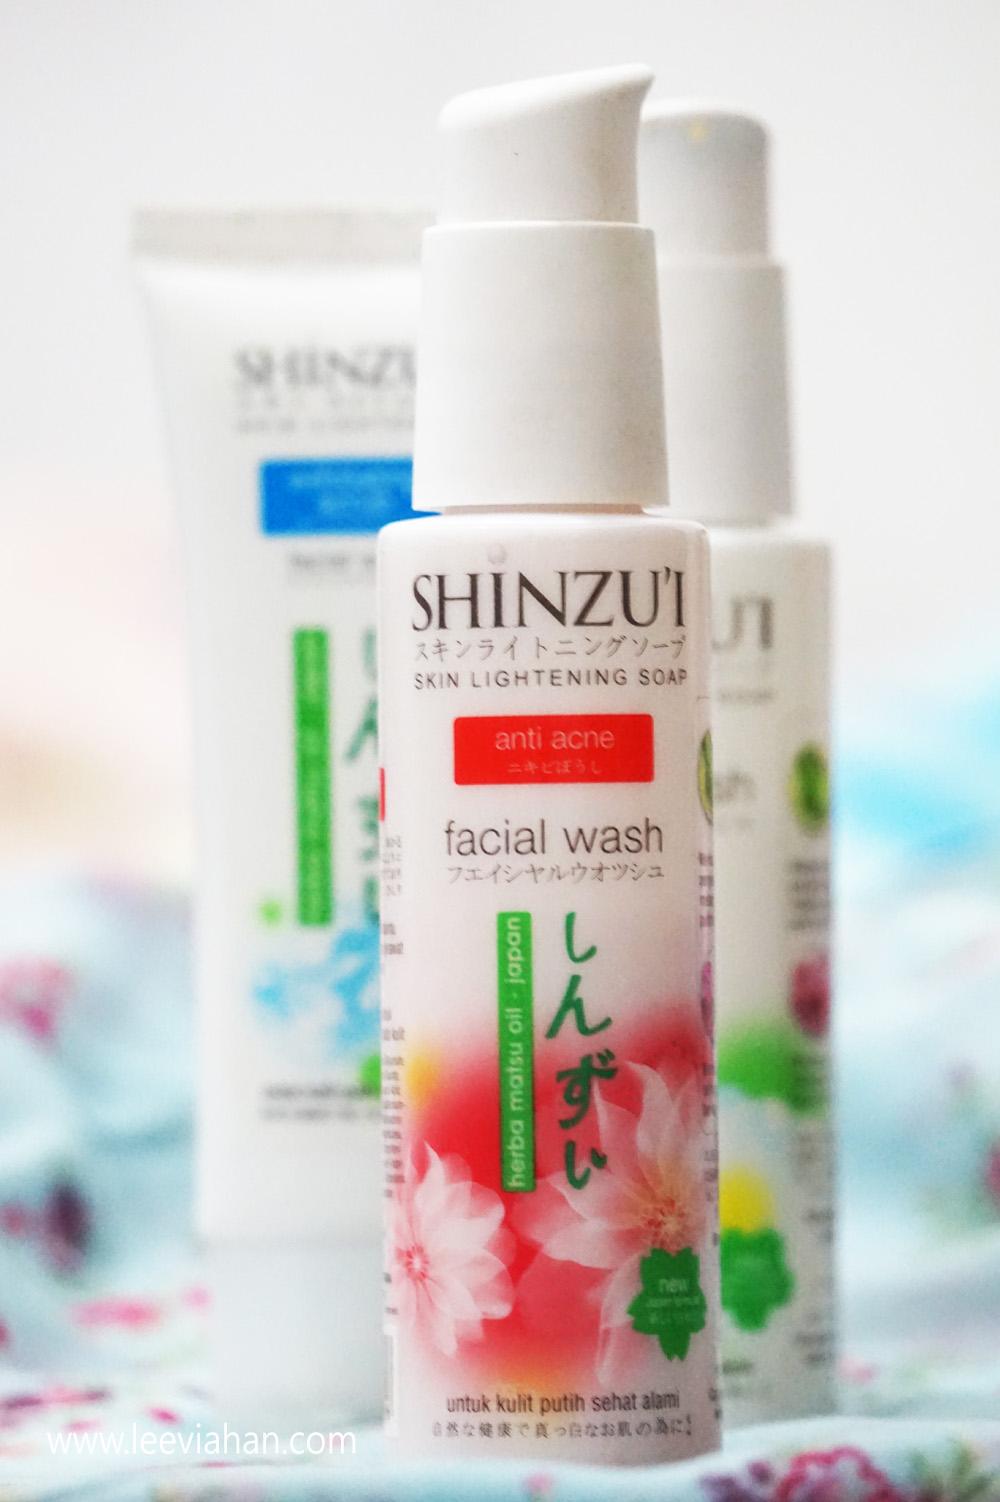 Jual Sabun Shinzui Welcome To Batang Beauty Blogger Indonesia By Lee Via Han White